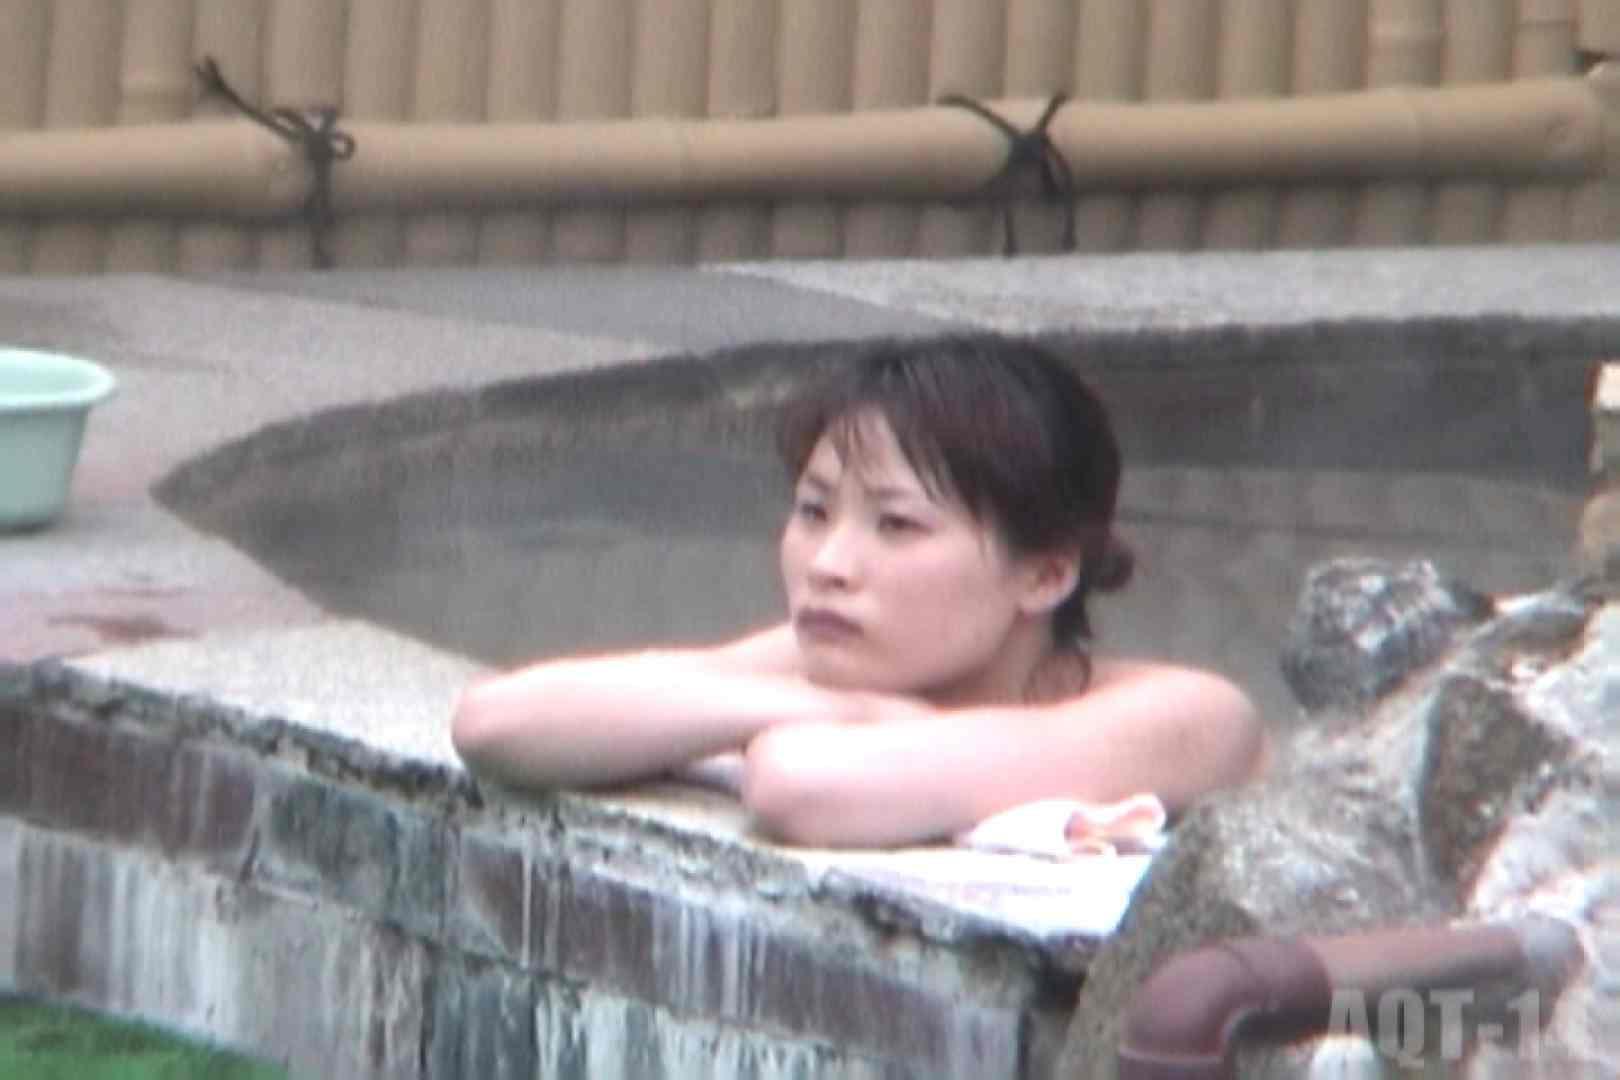 Aquaな露天風呂Vol.822 盗撮 オメコ無修正動画無料 62連発 2